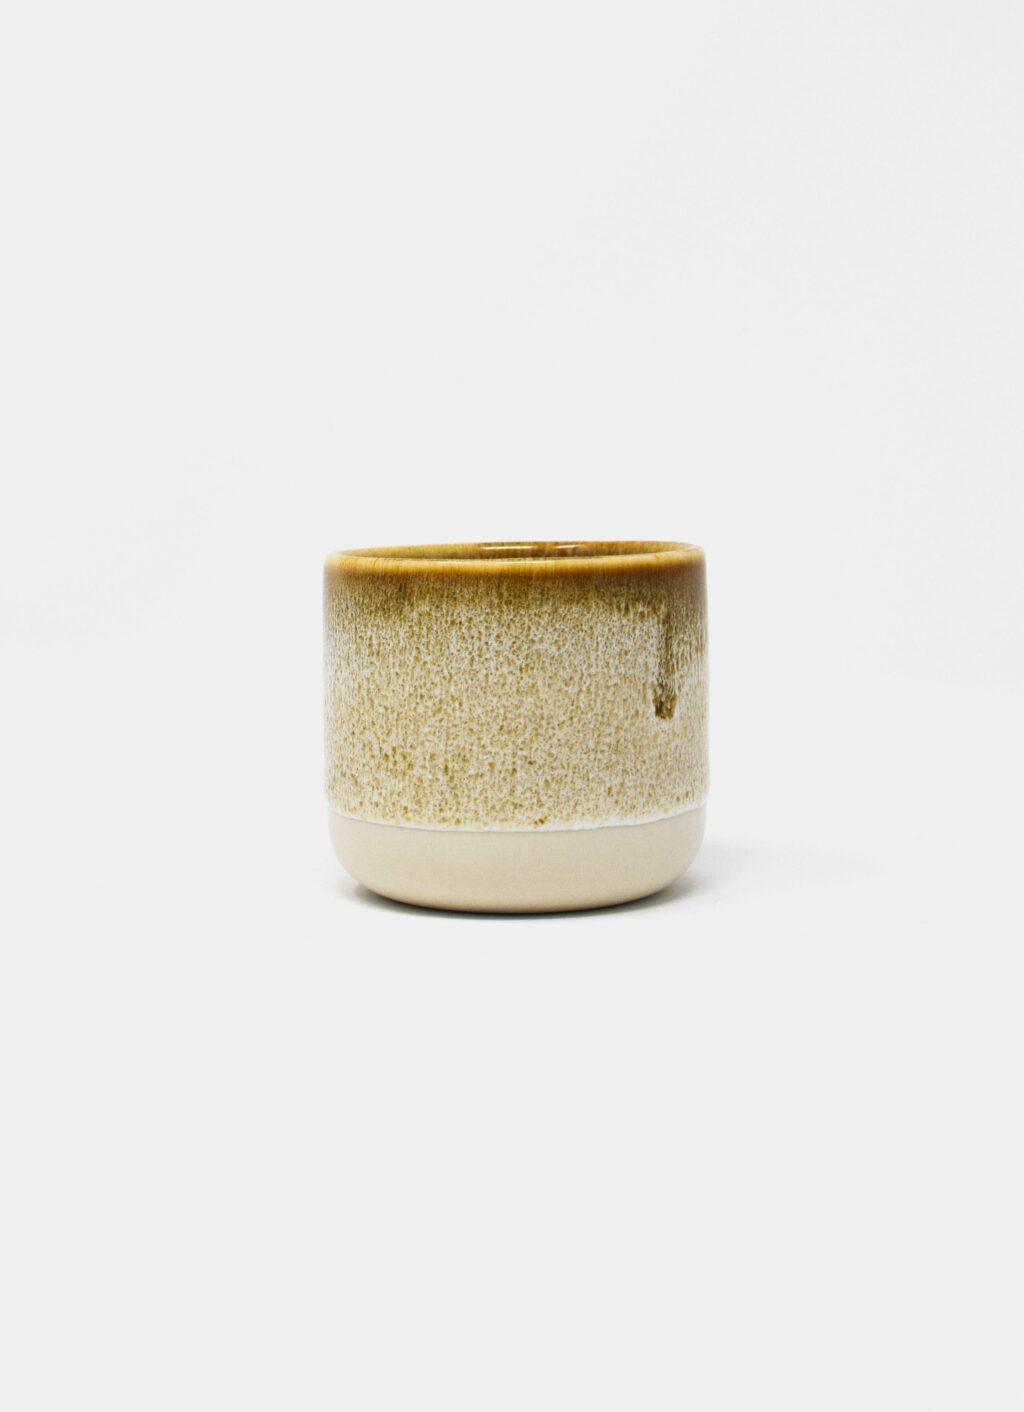 Studio Arhoj - Sip Cup - Chocolate Fizz